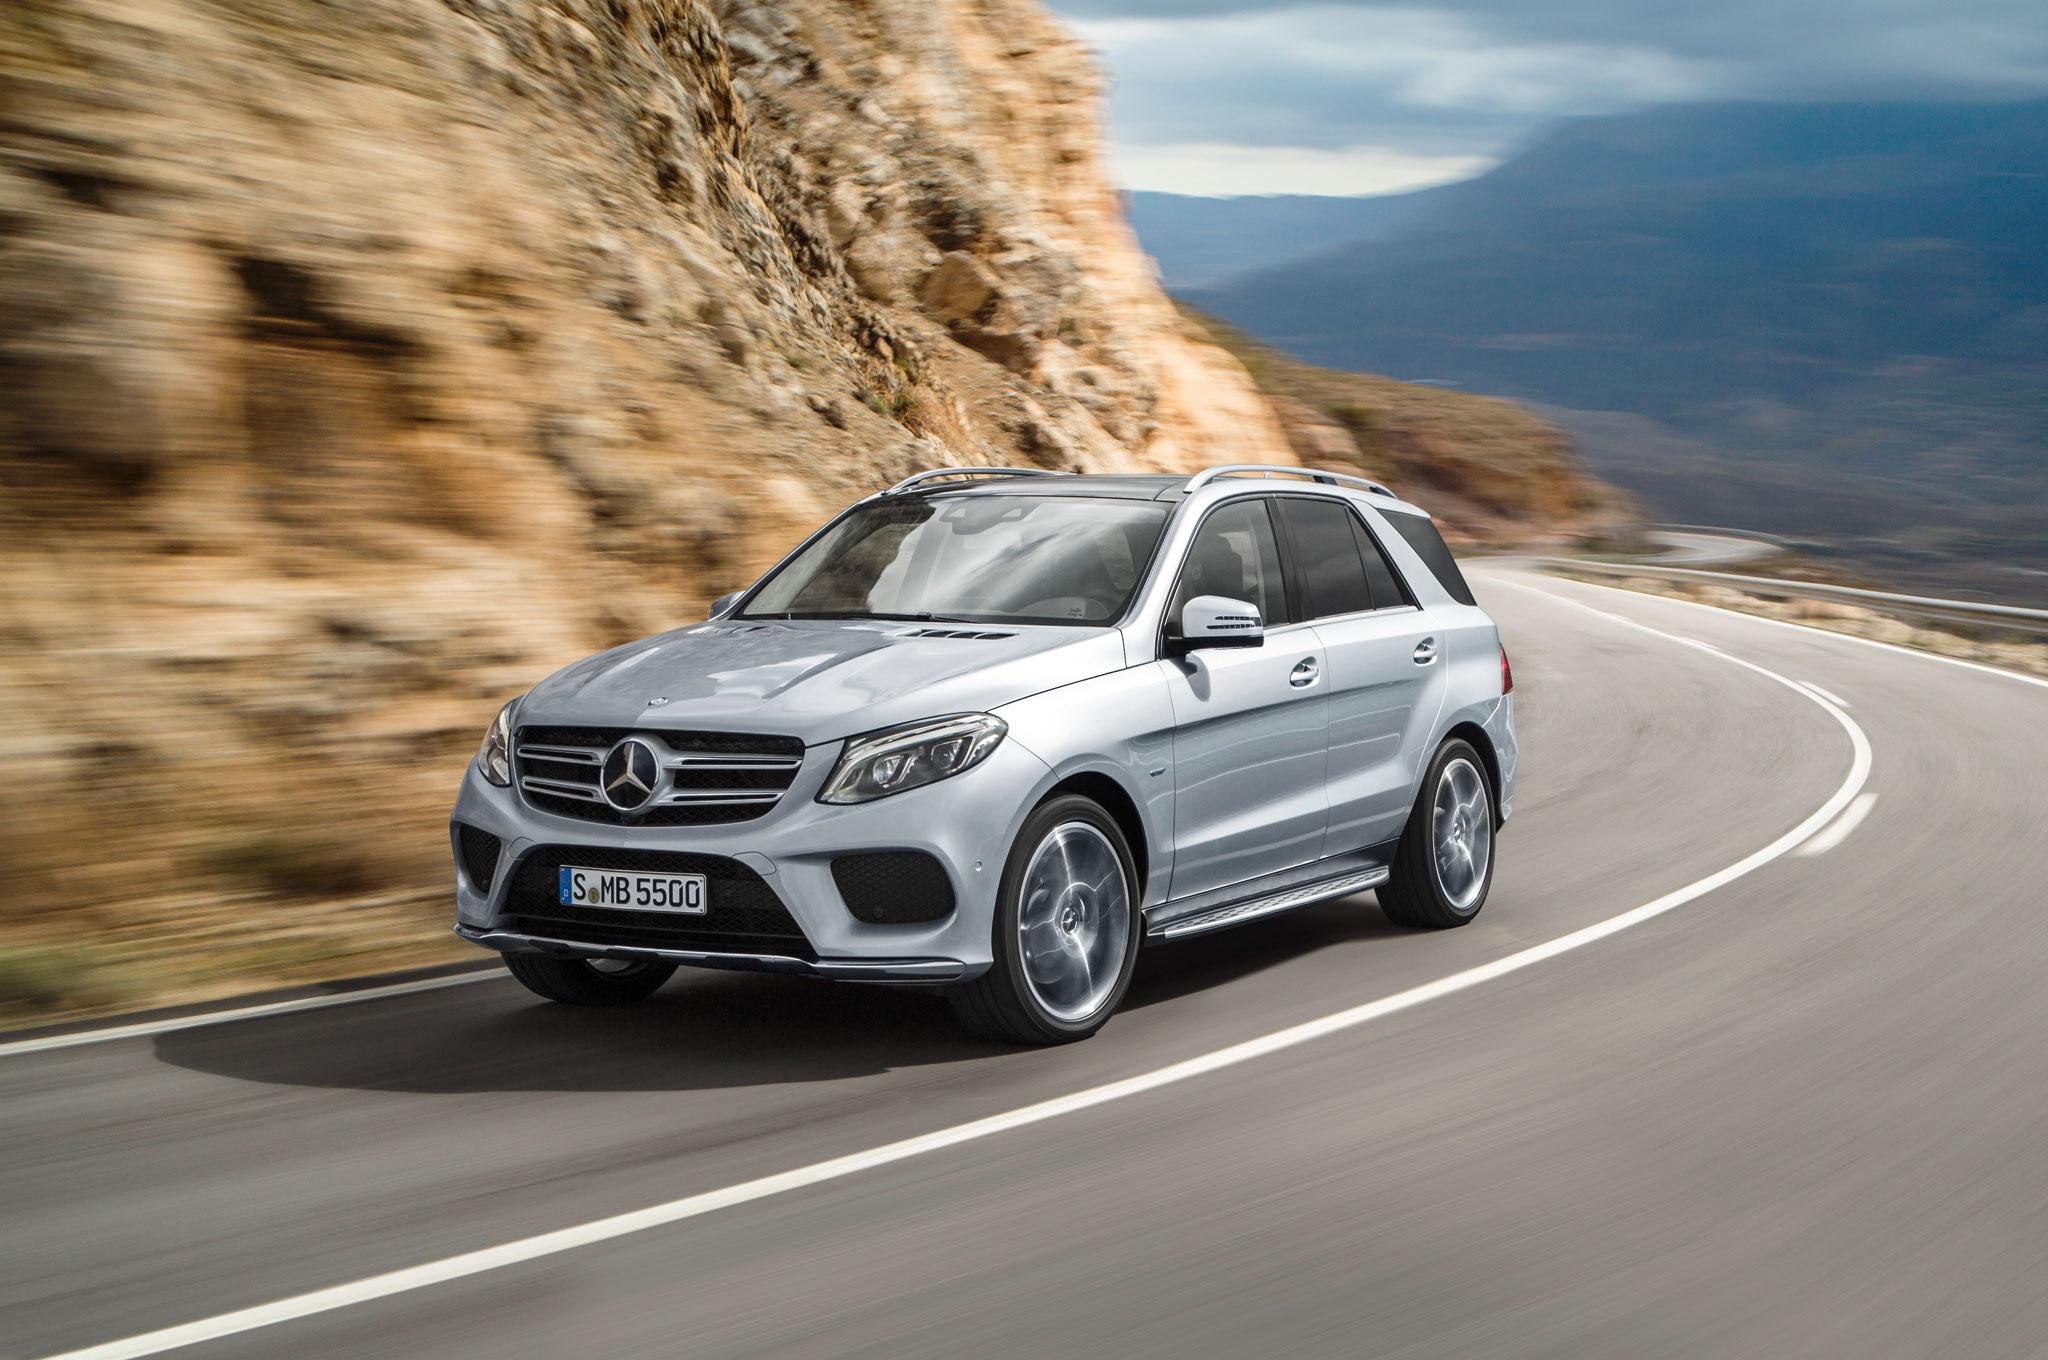 2016 Mercedes Benz Gle Class Review